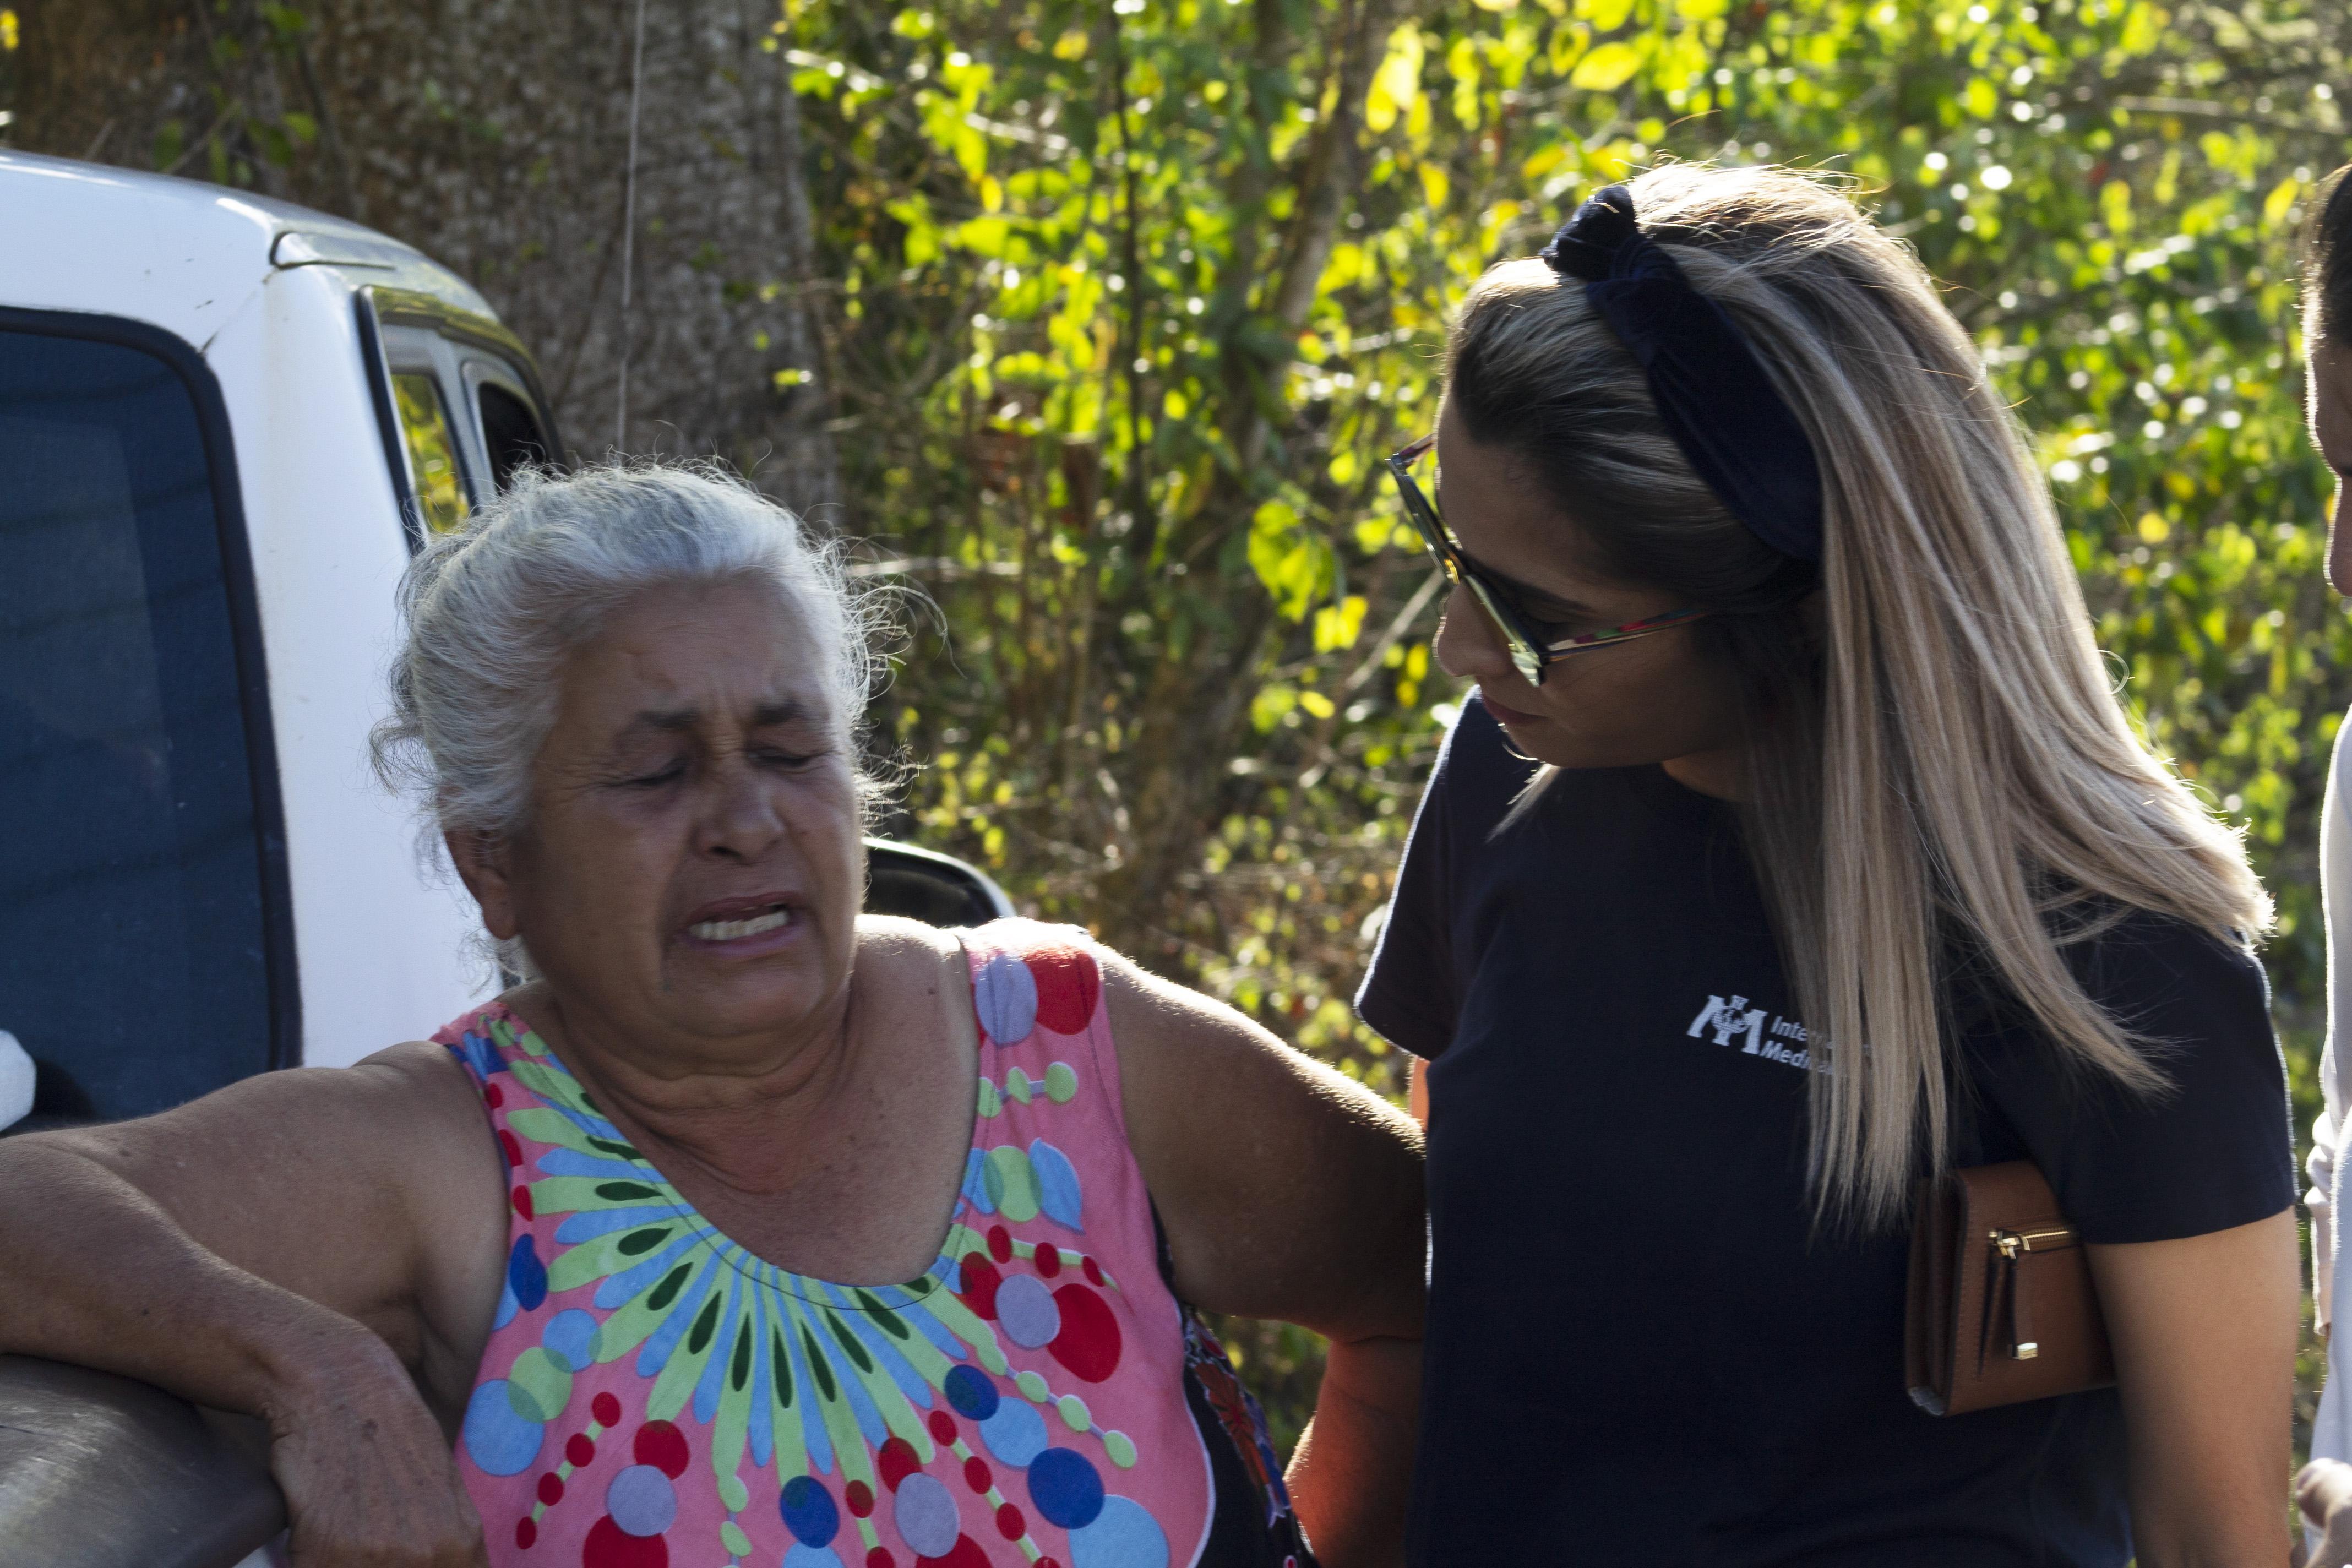 MHPSS in Puerto Rico